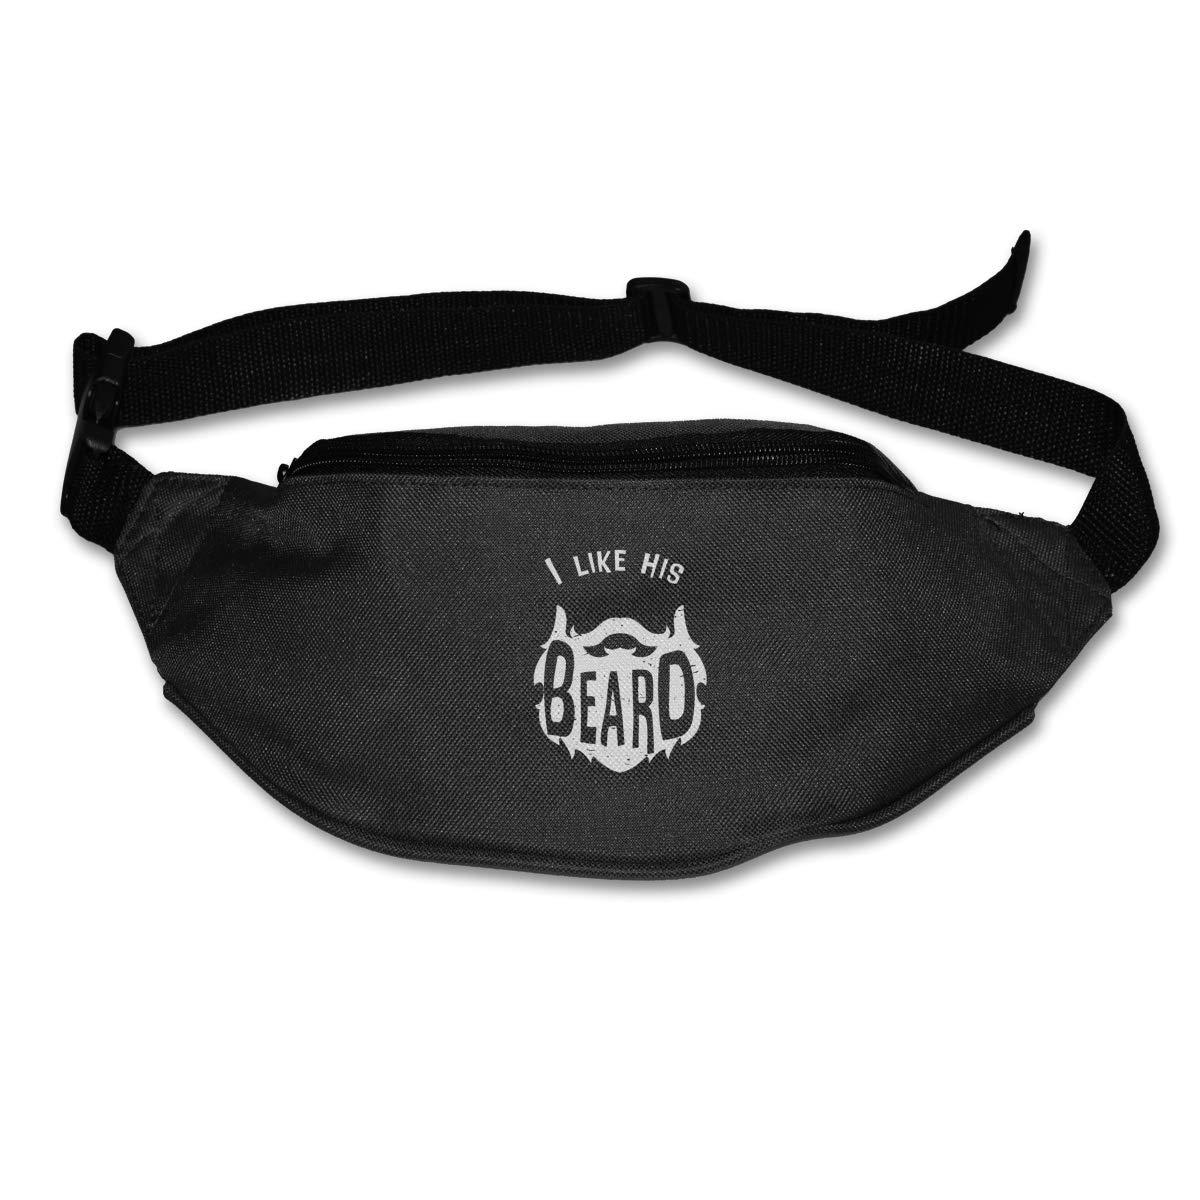 I Like HIs Beard Sport Waist Bag Fanny Pack Adjustable For Travel